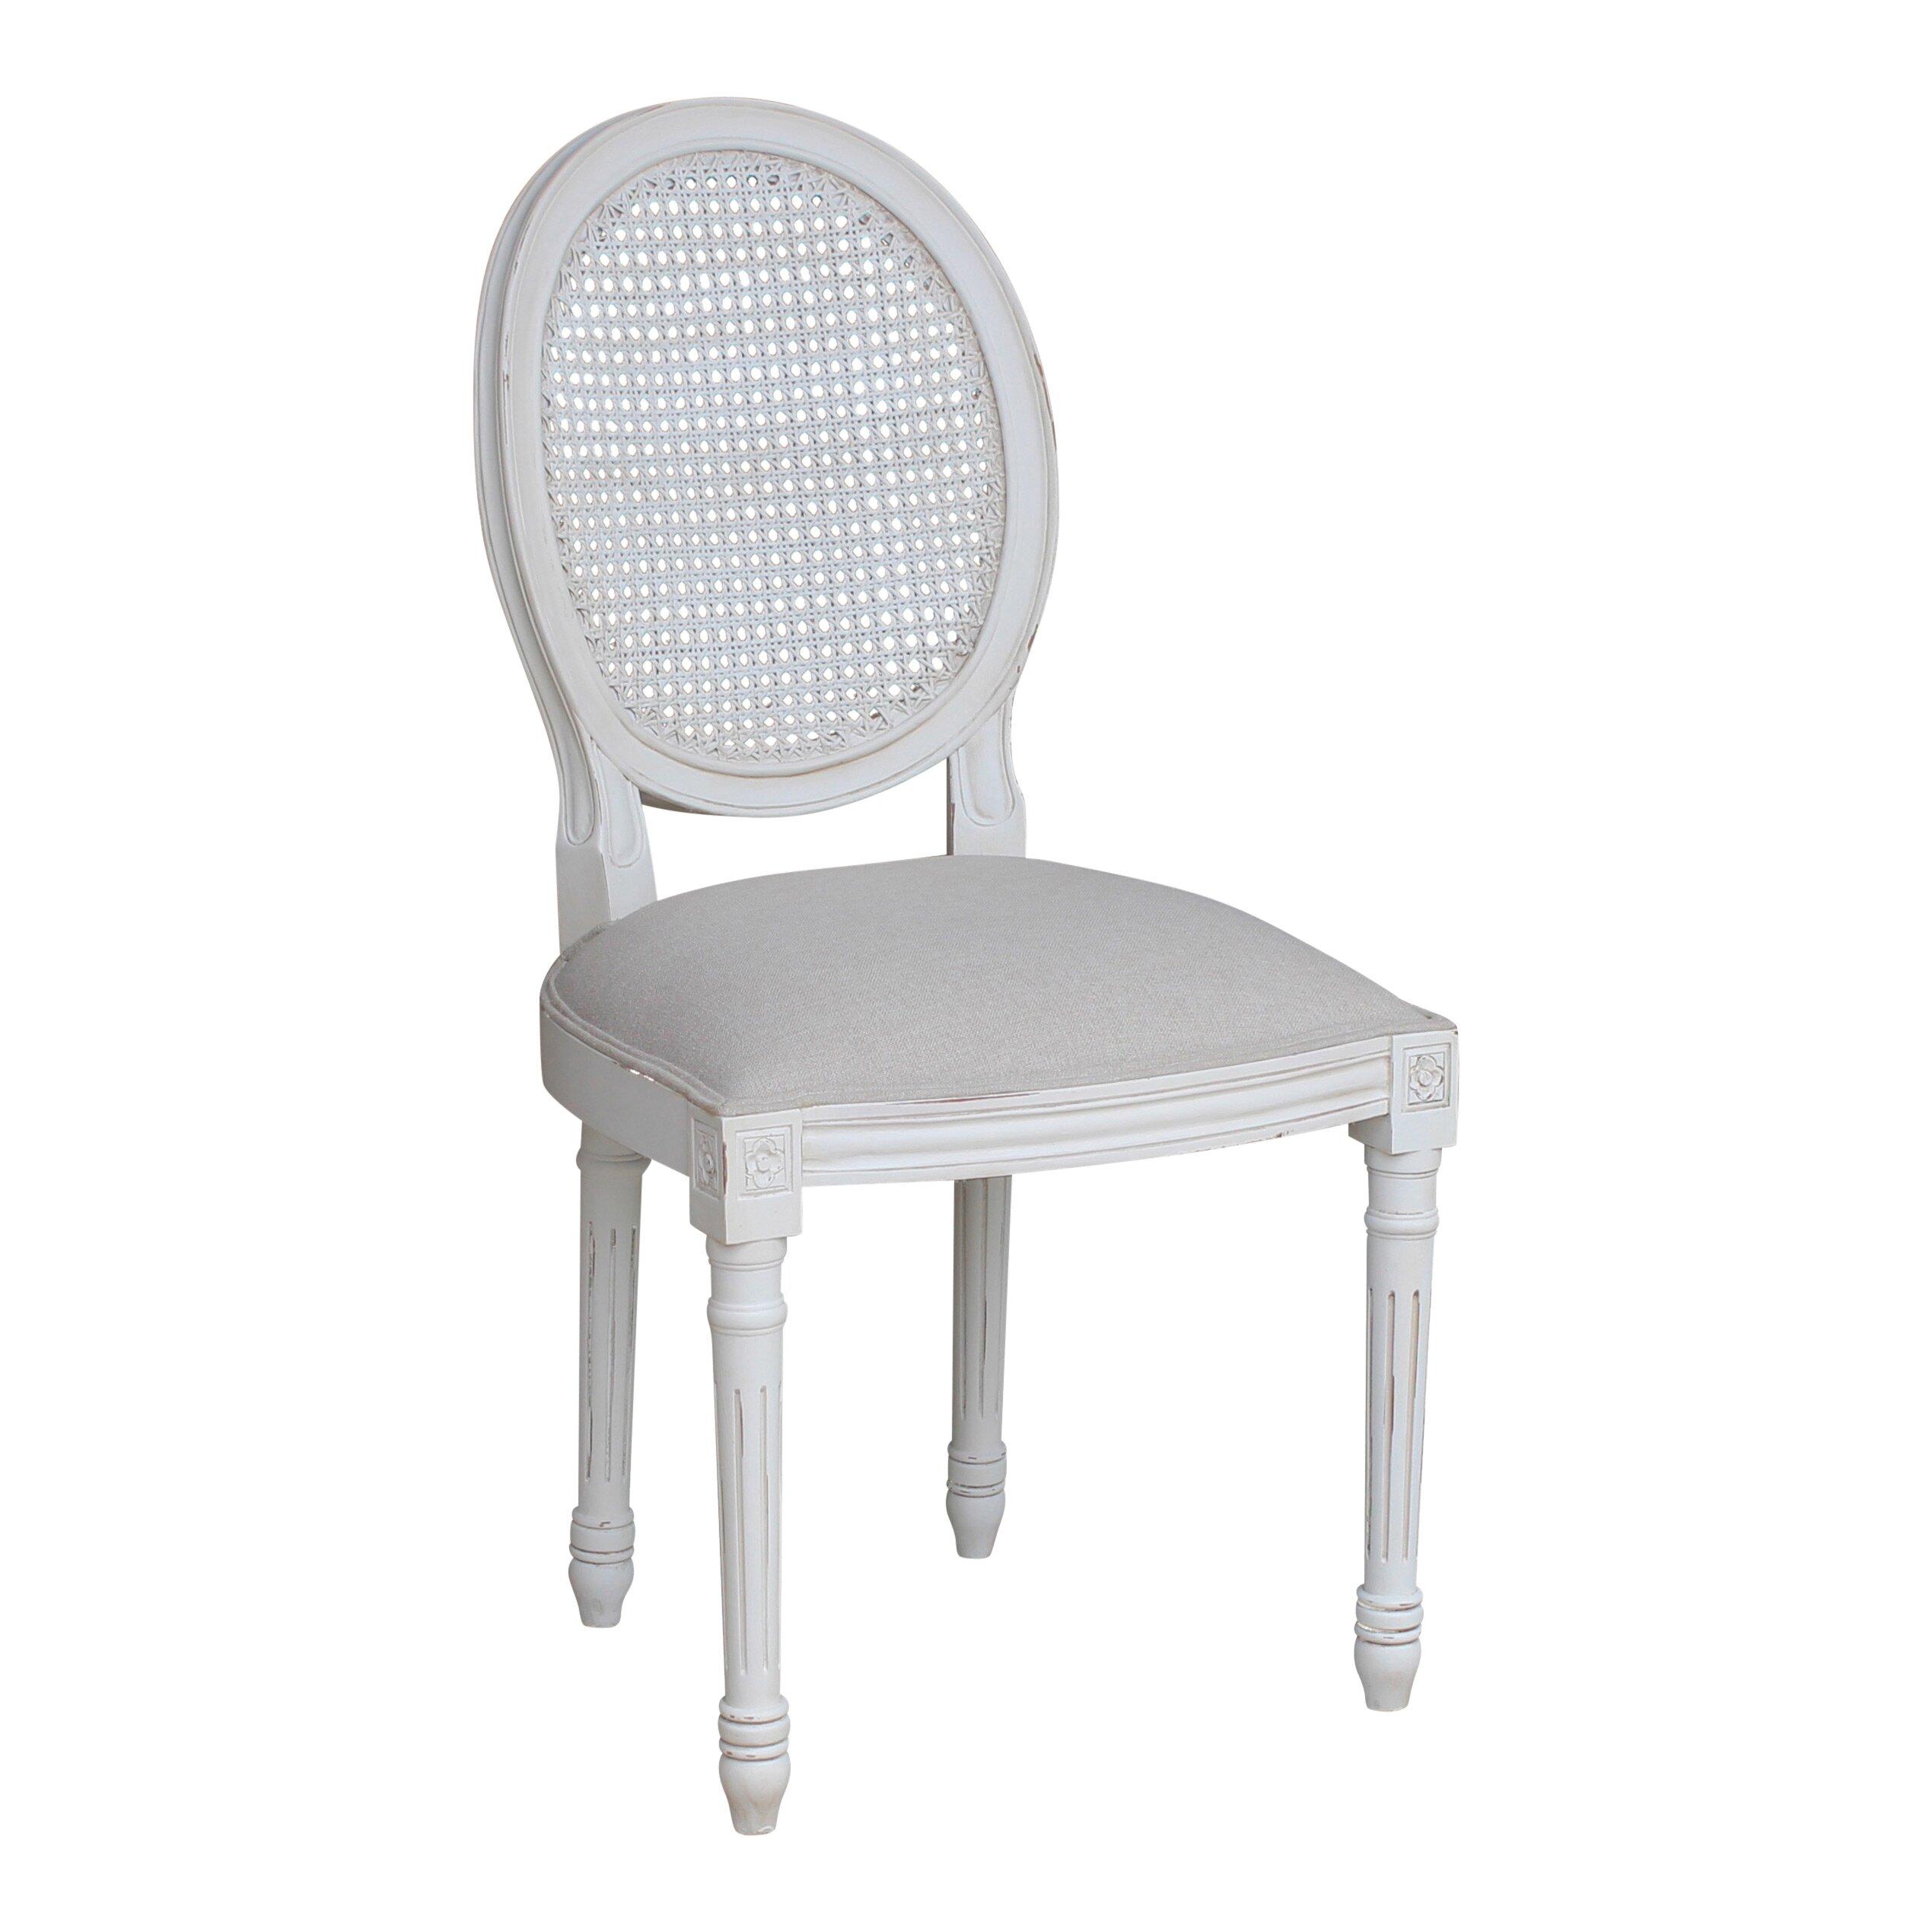 Maine Furniture Co Sebago Solid Wood Upholstered Dining Chair Reviews Wayfair Uk